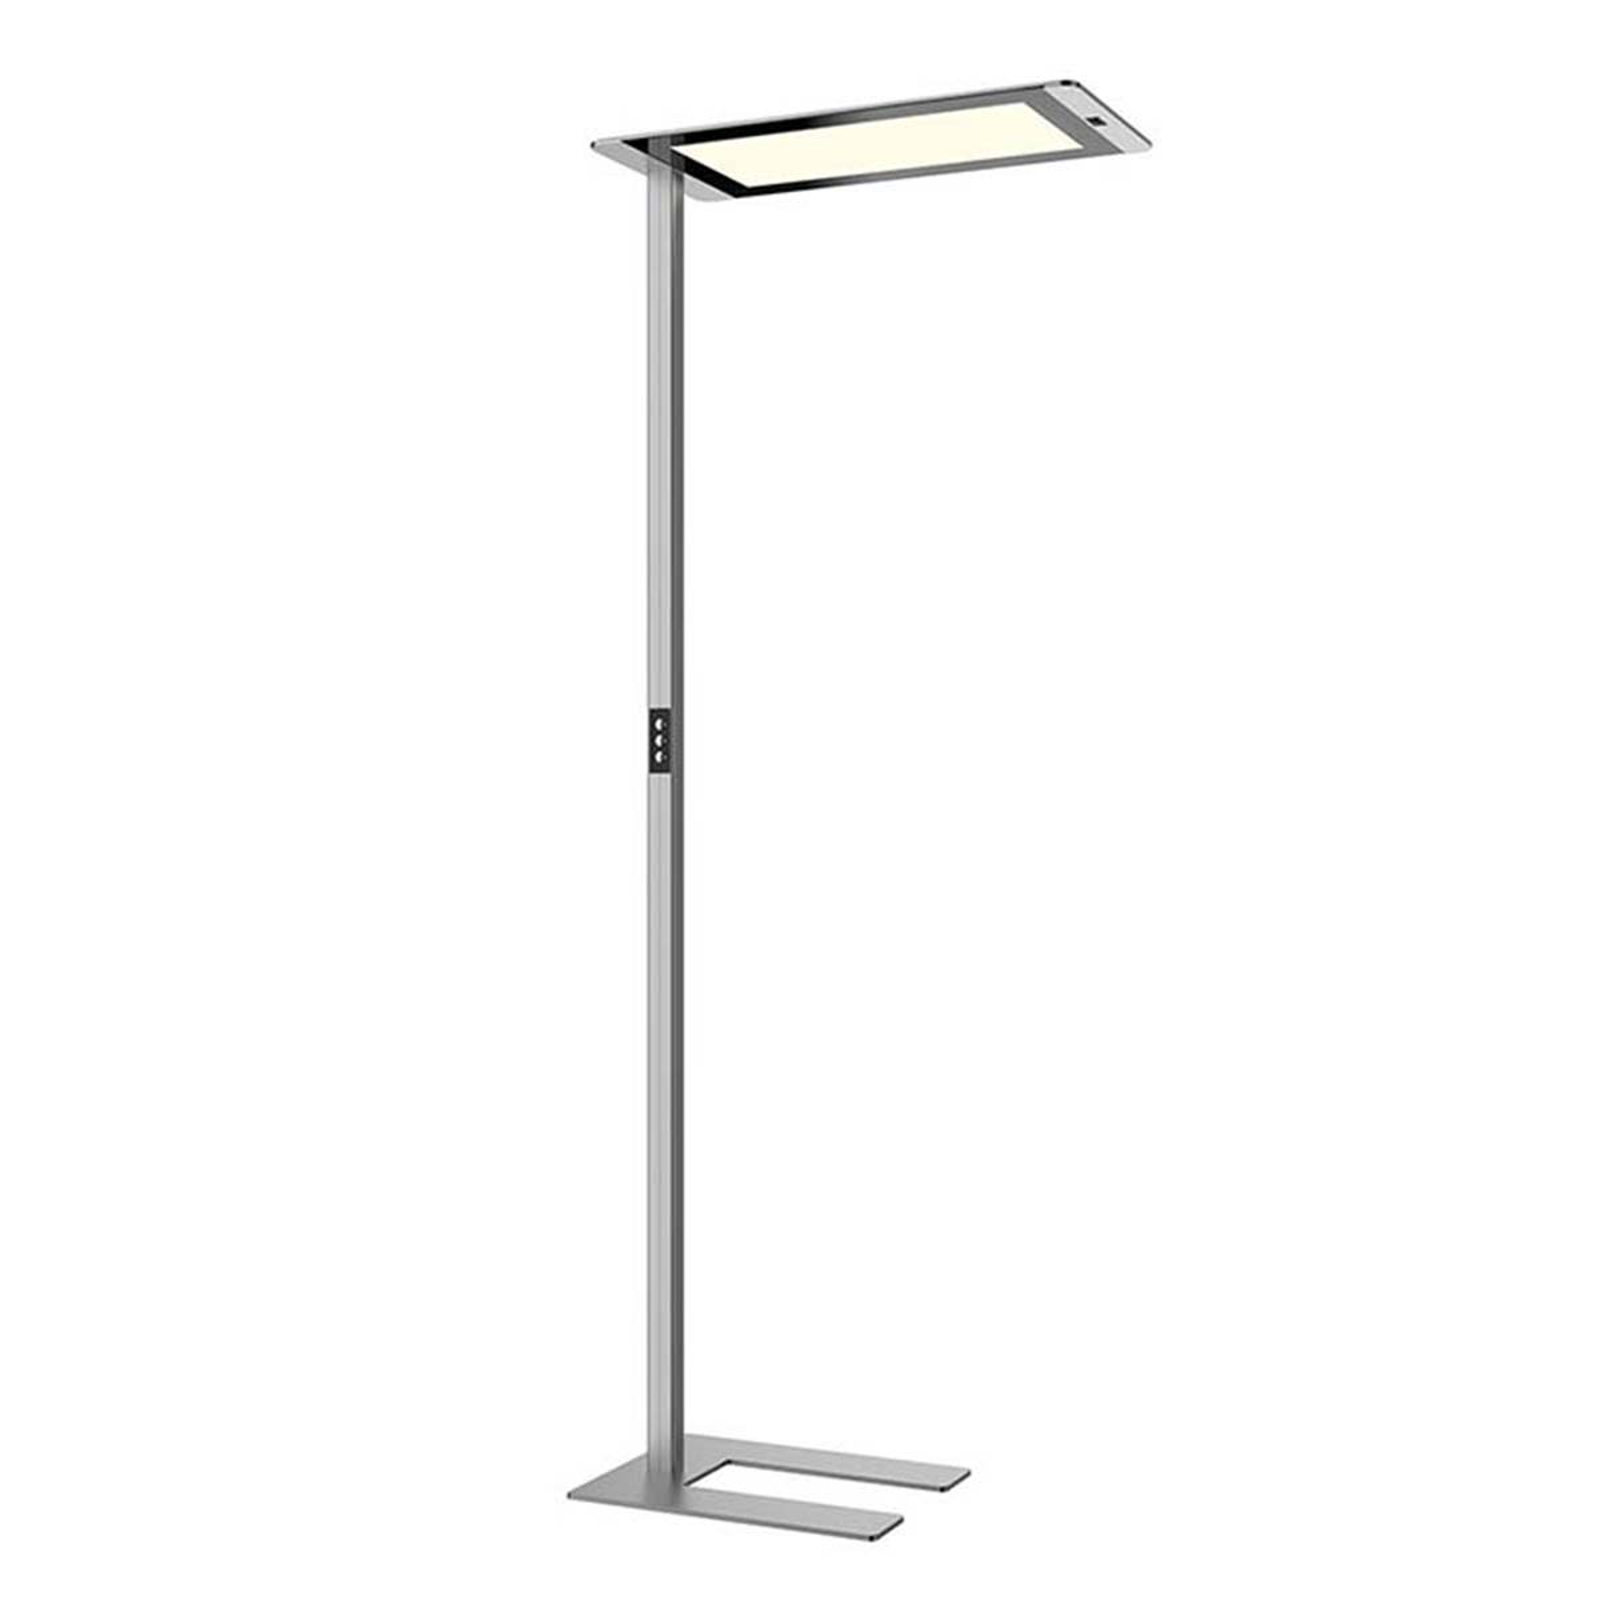 GRIMMEISEN Onyxx air Free Dim lampa stojąca 85W